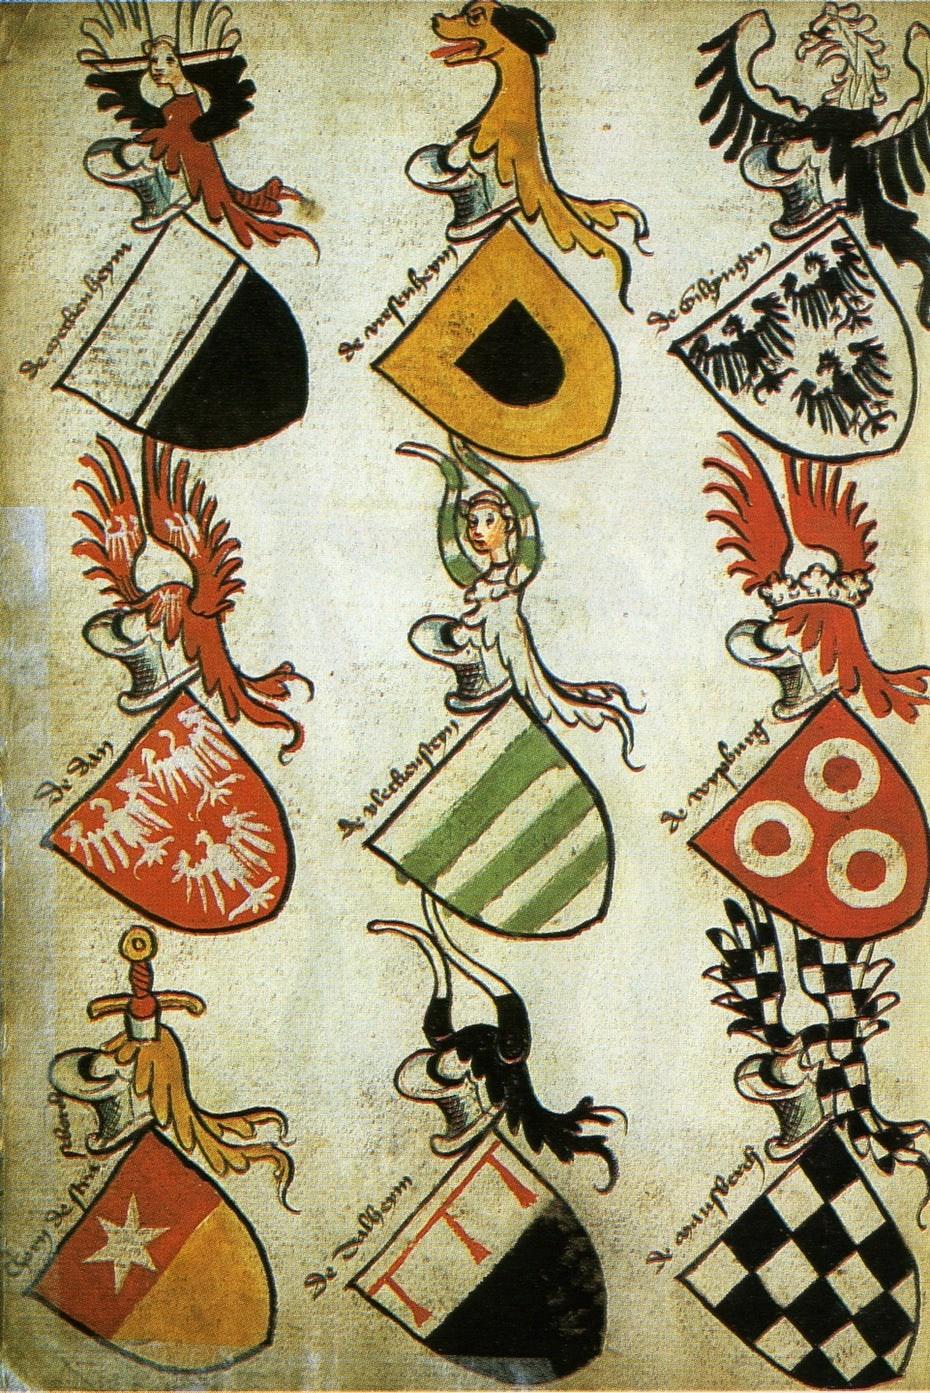 1600s German coats-of-arms